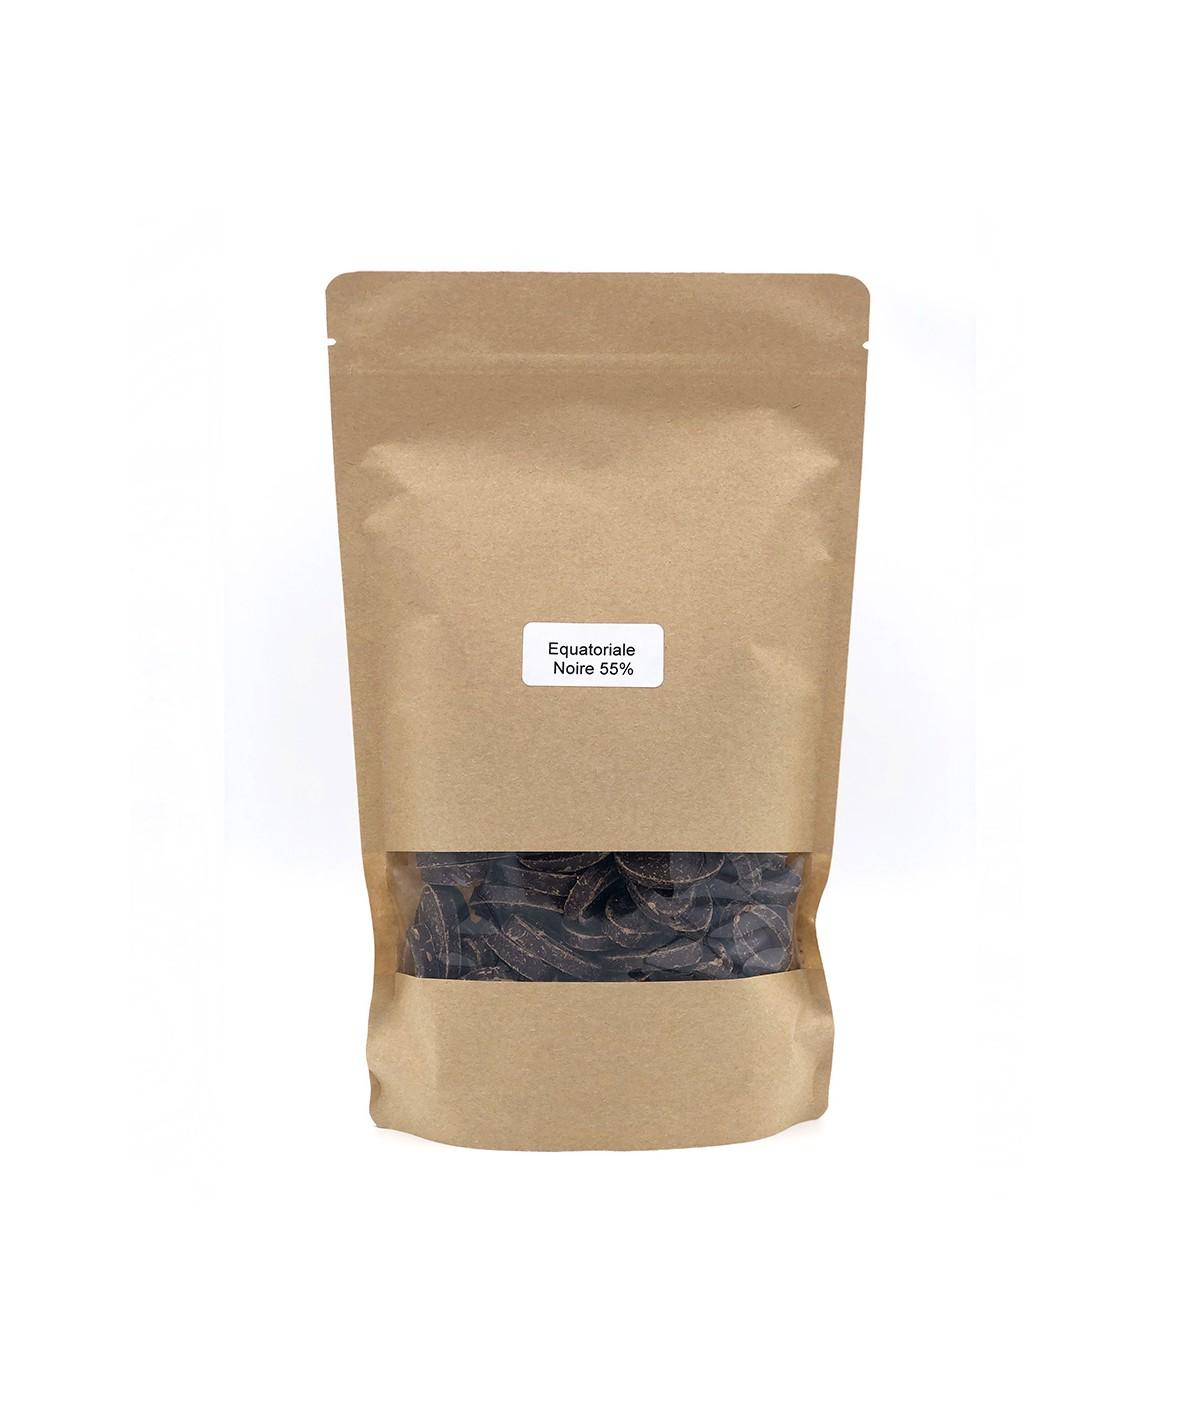 Valrhona Equatoriale Noire 500g